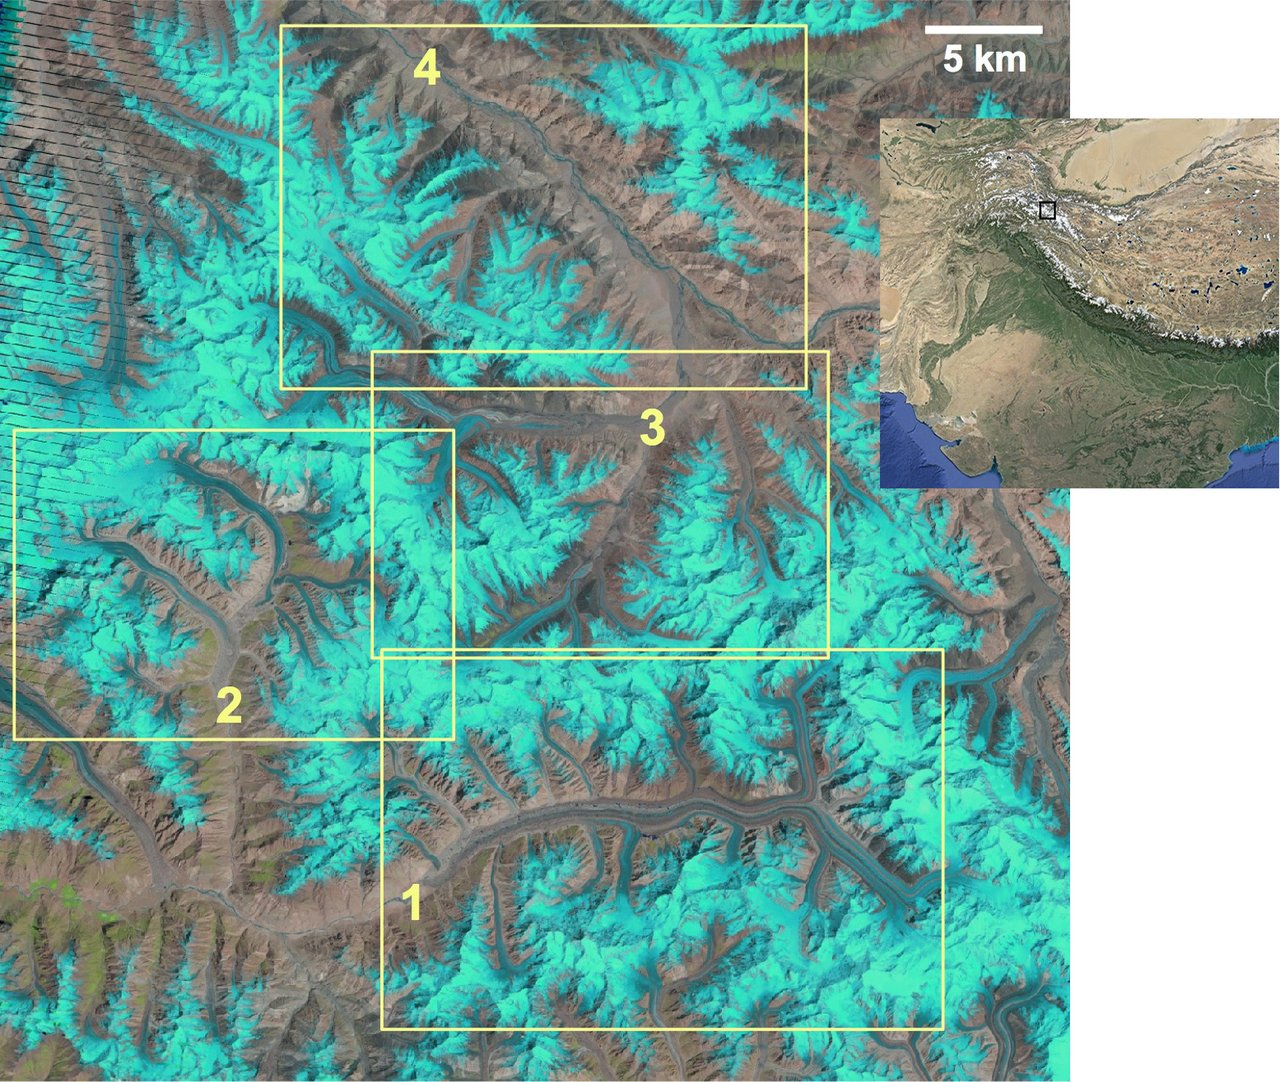 Experts map glacier movement in Karakoram range